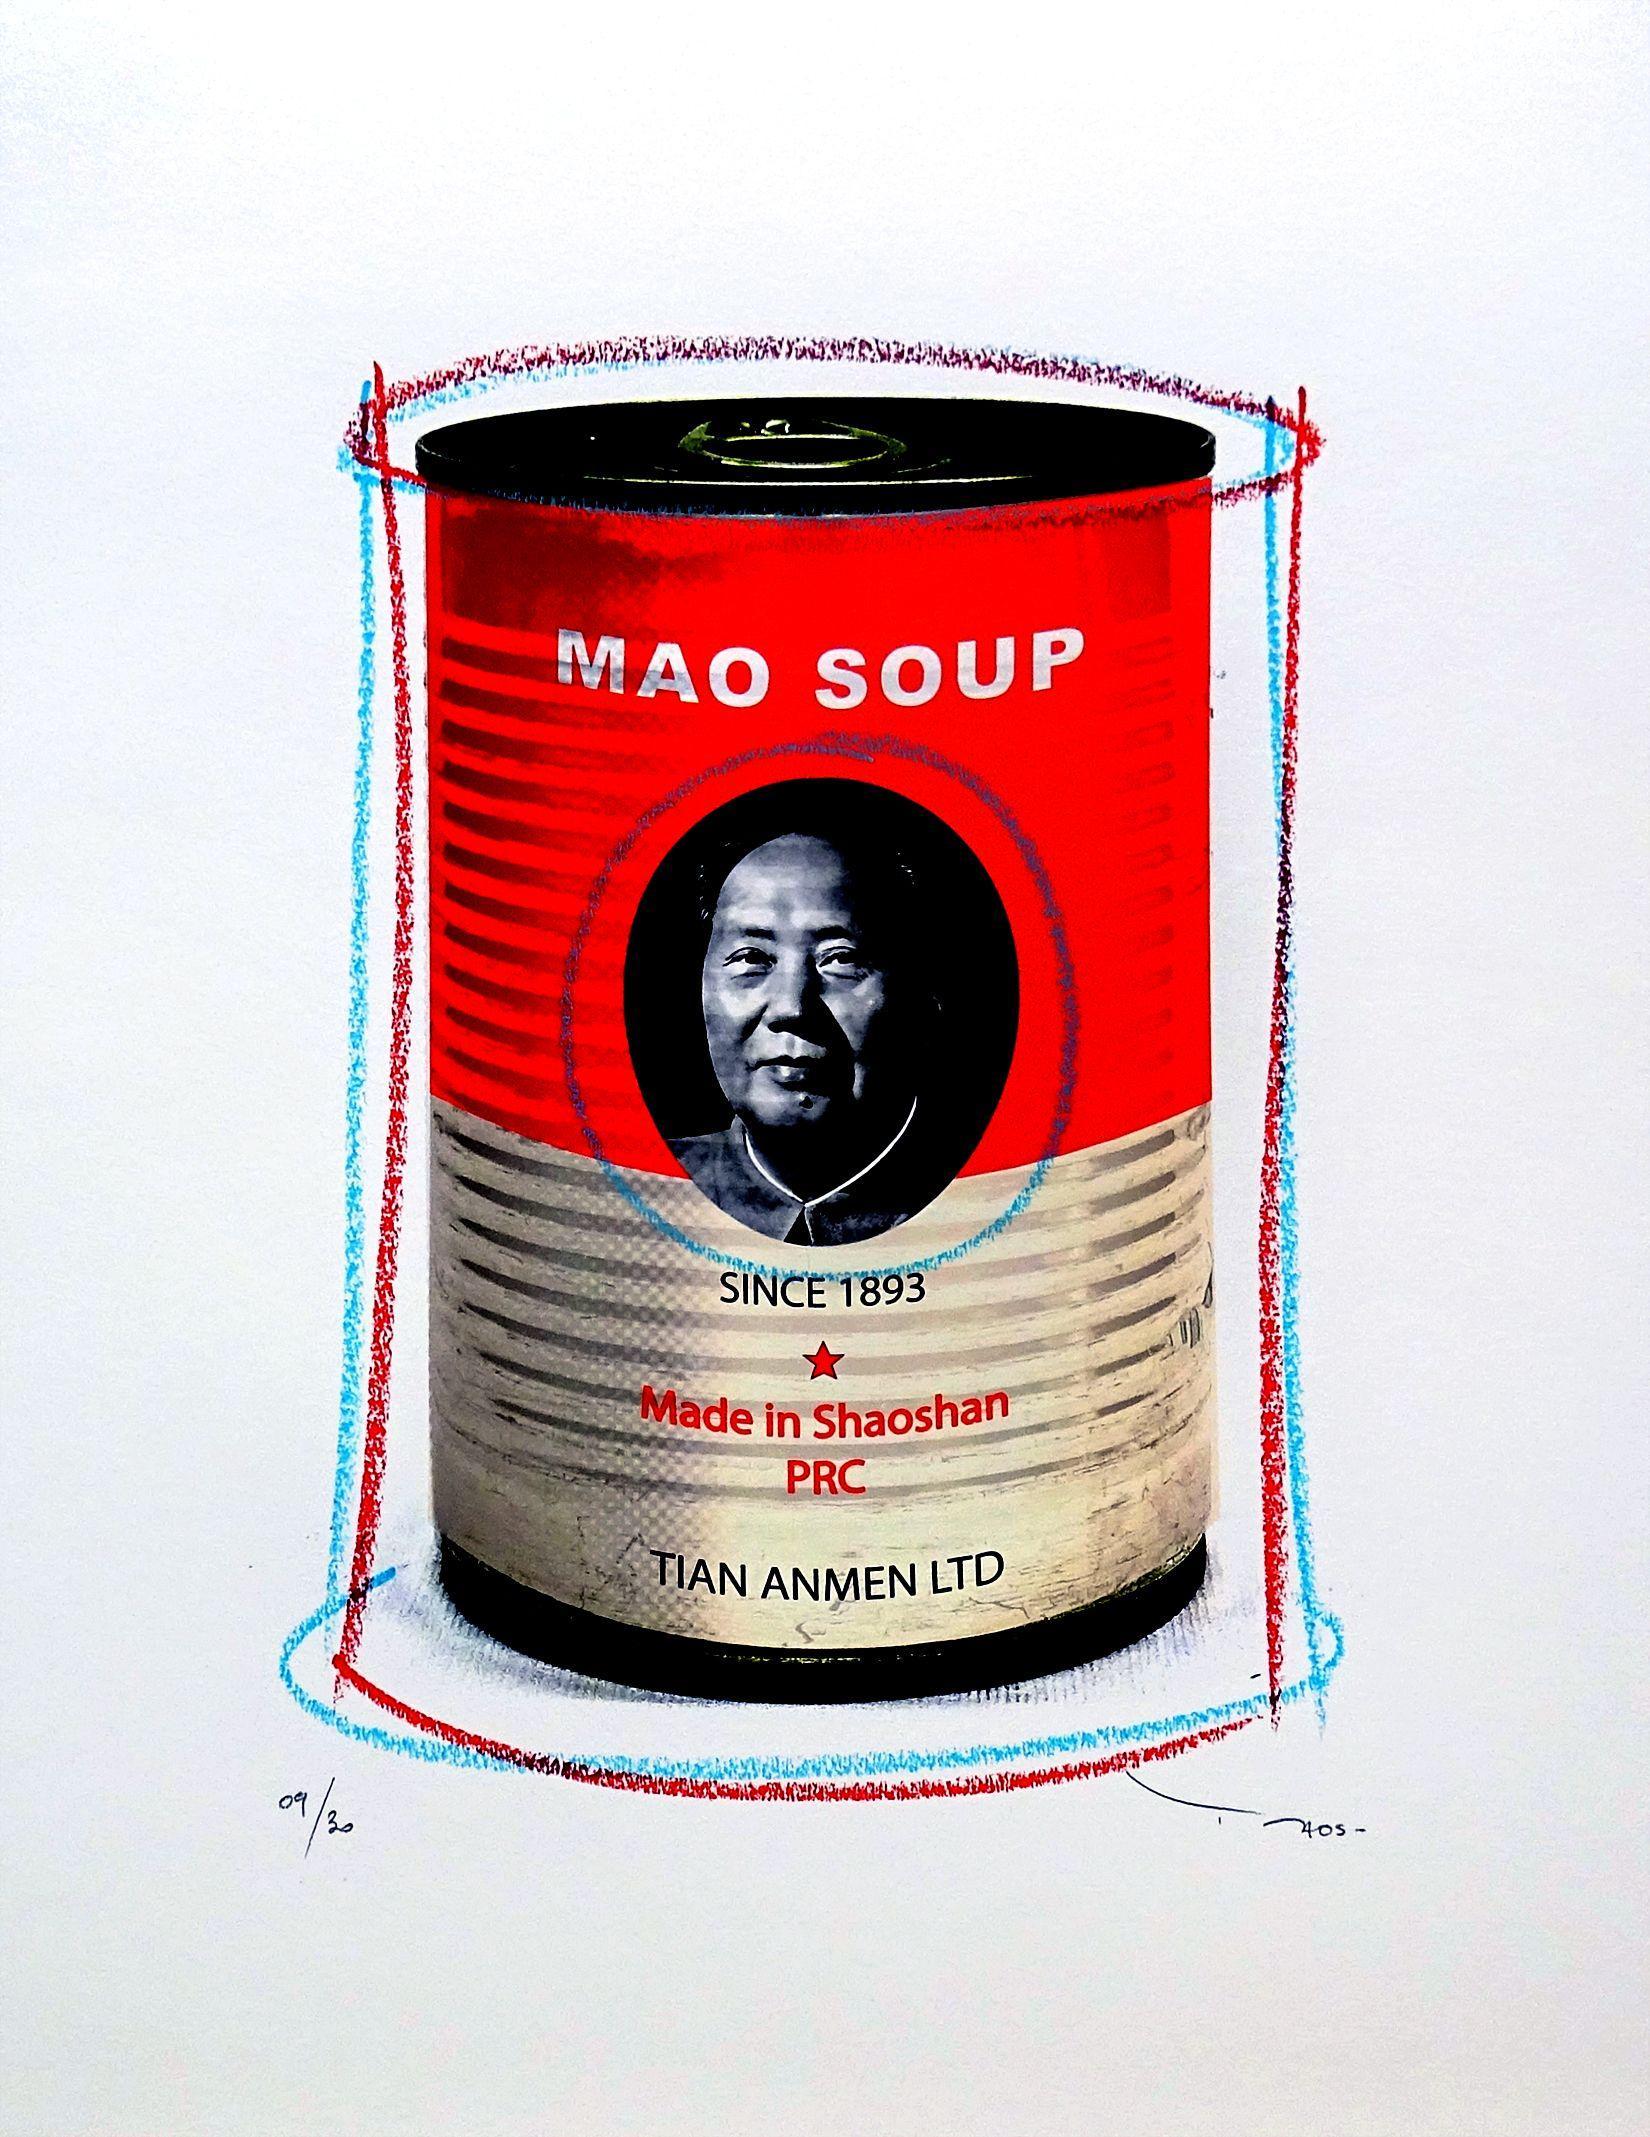 Tehos - Mao Soup, Mixed Media on Paper